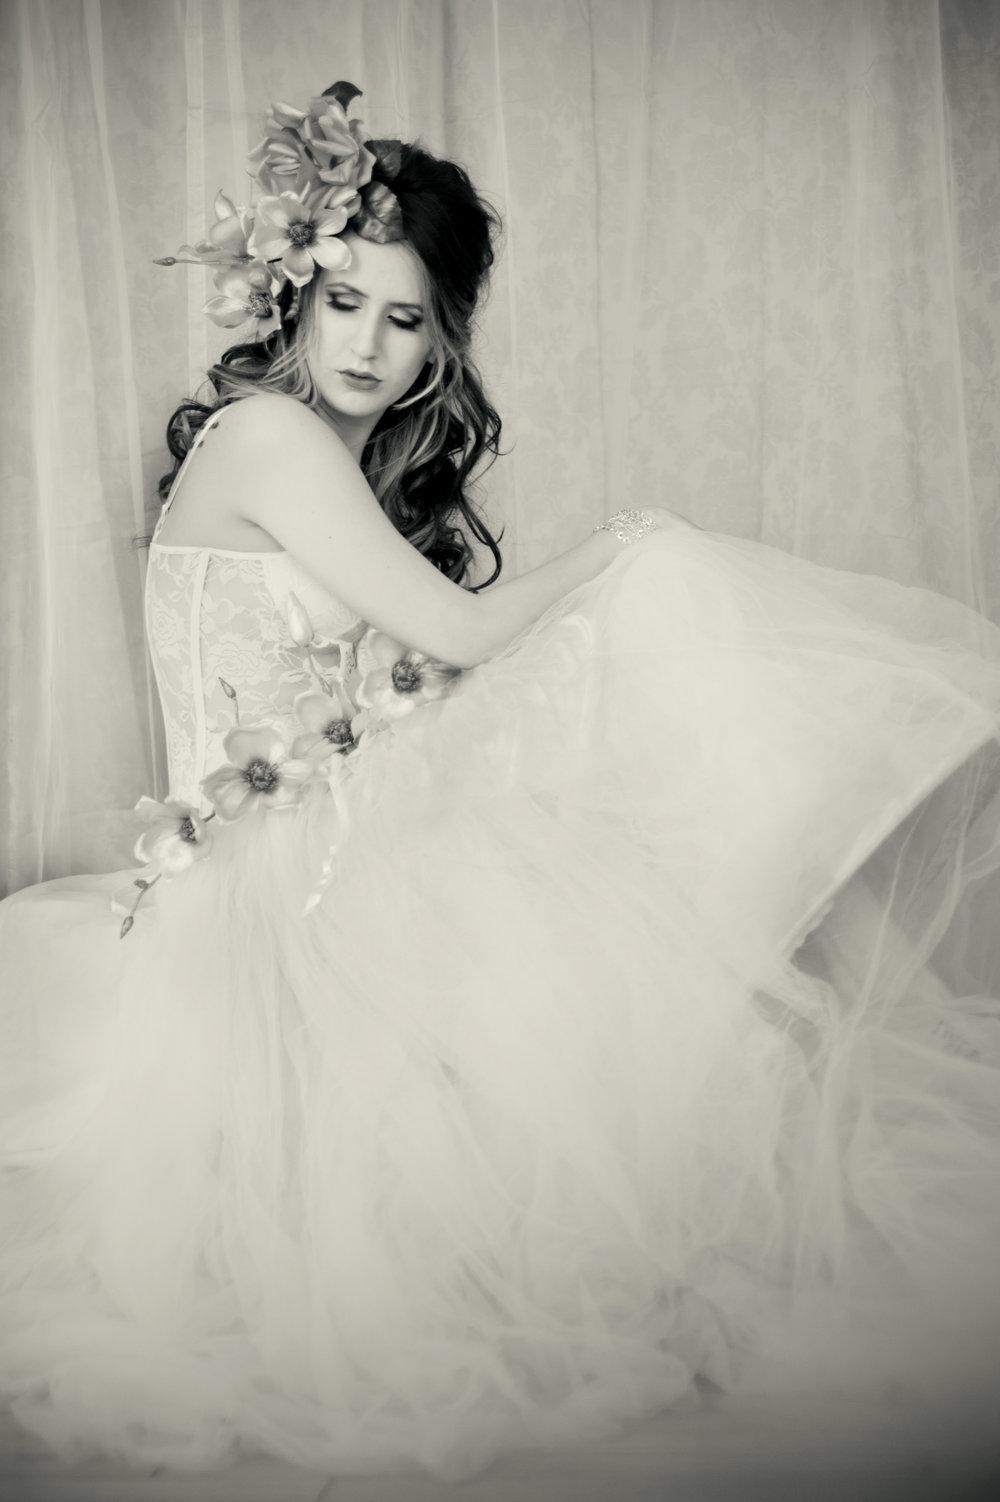 Marta-Hewson-Themed-portrait-Kristina-Jovanovic-pensive-bride.jpg